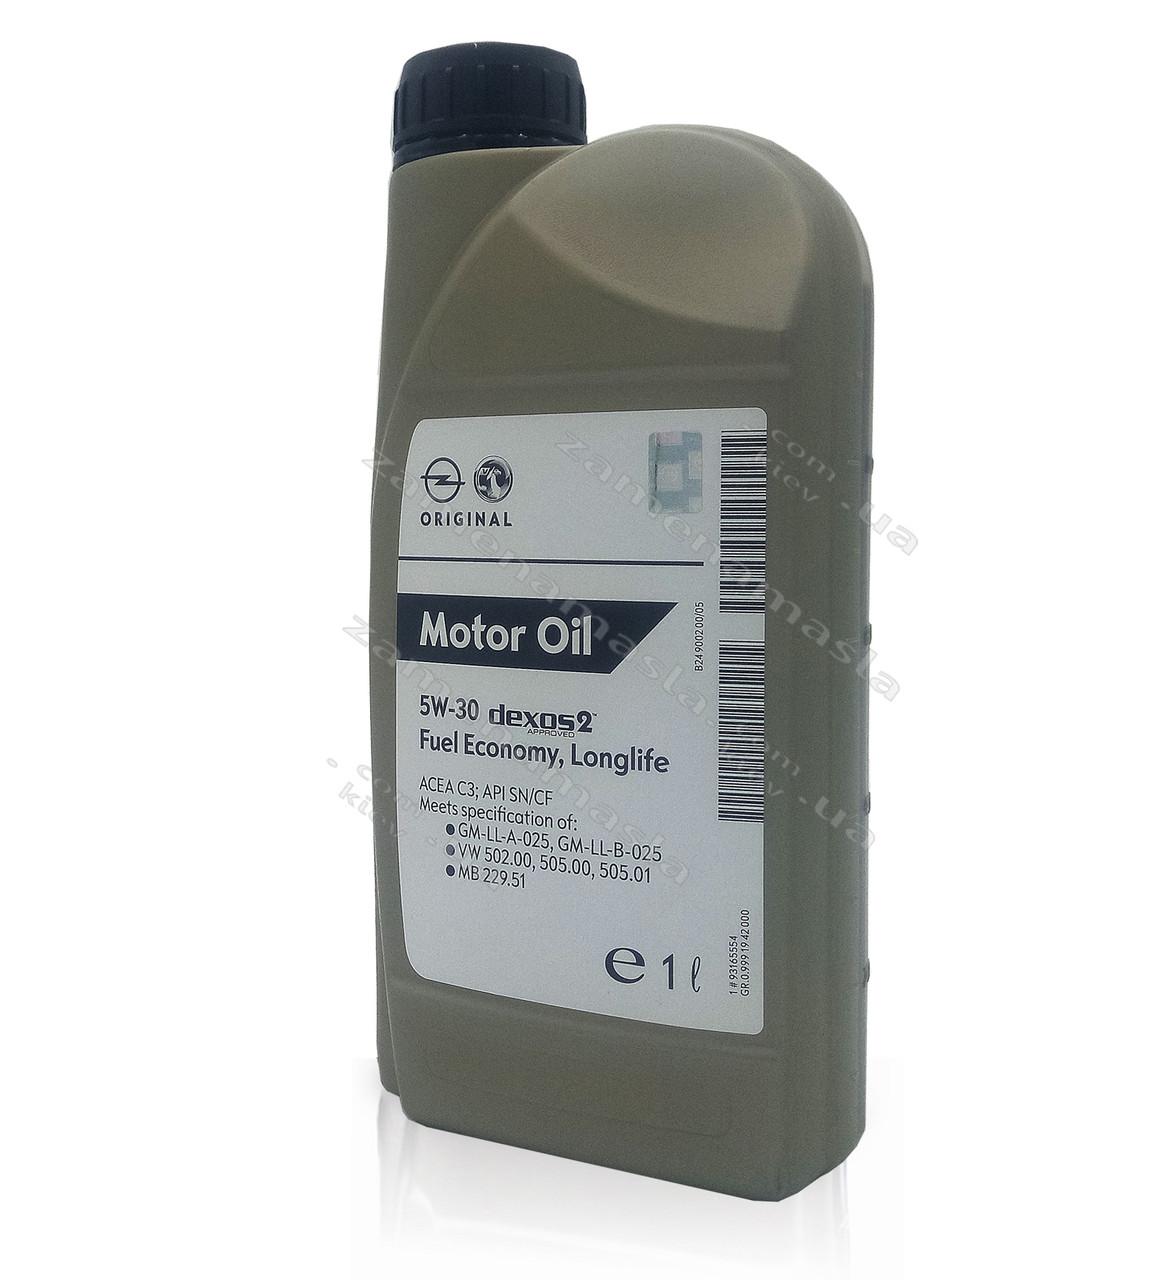 Genuine GM 5W-30 1л - моторное масло